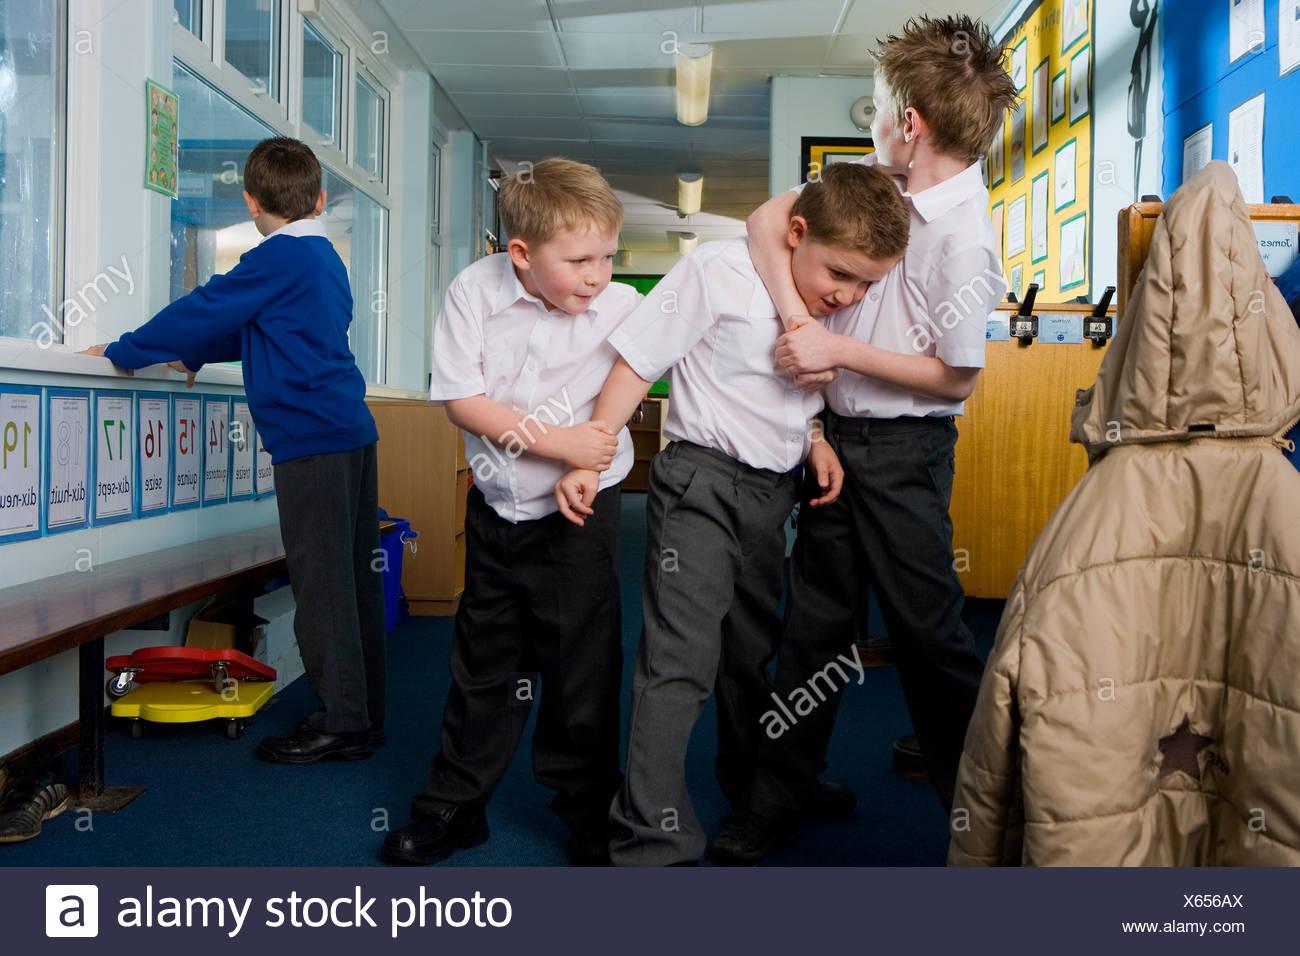 Aggressive school boys rough housing in classroom - Stock Image